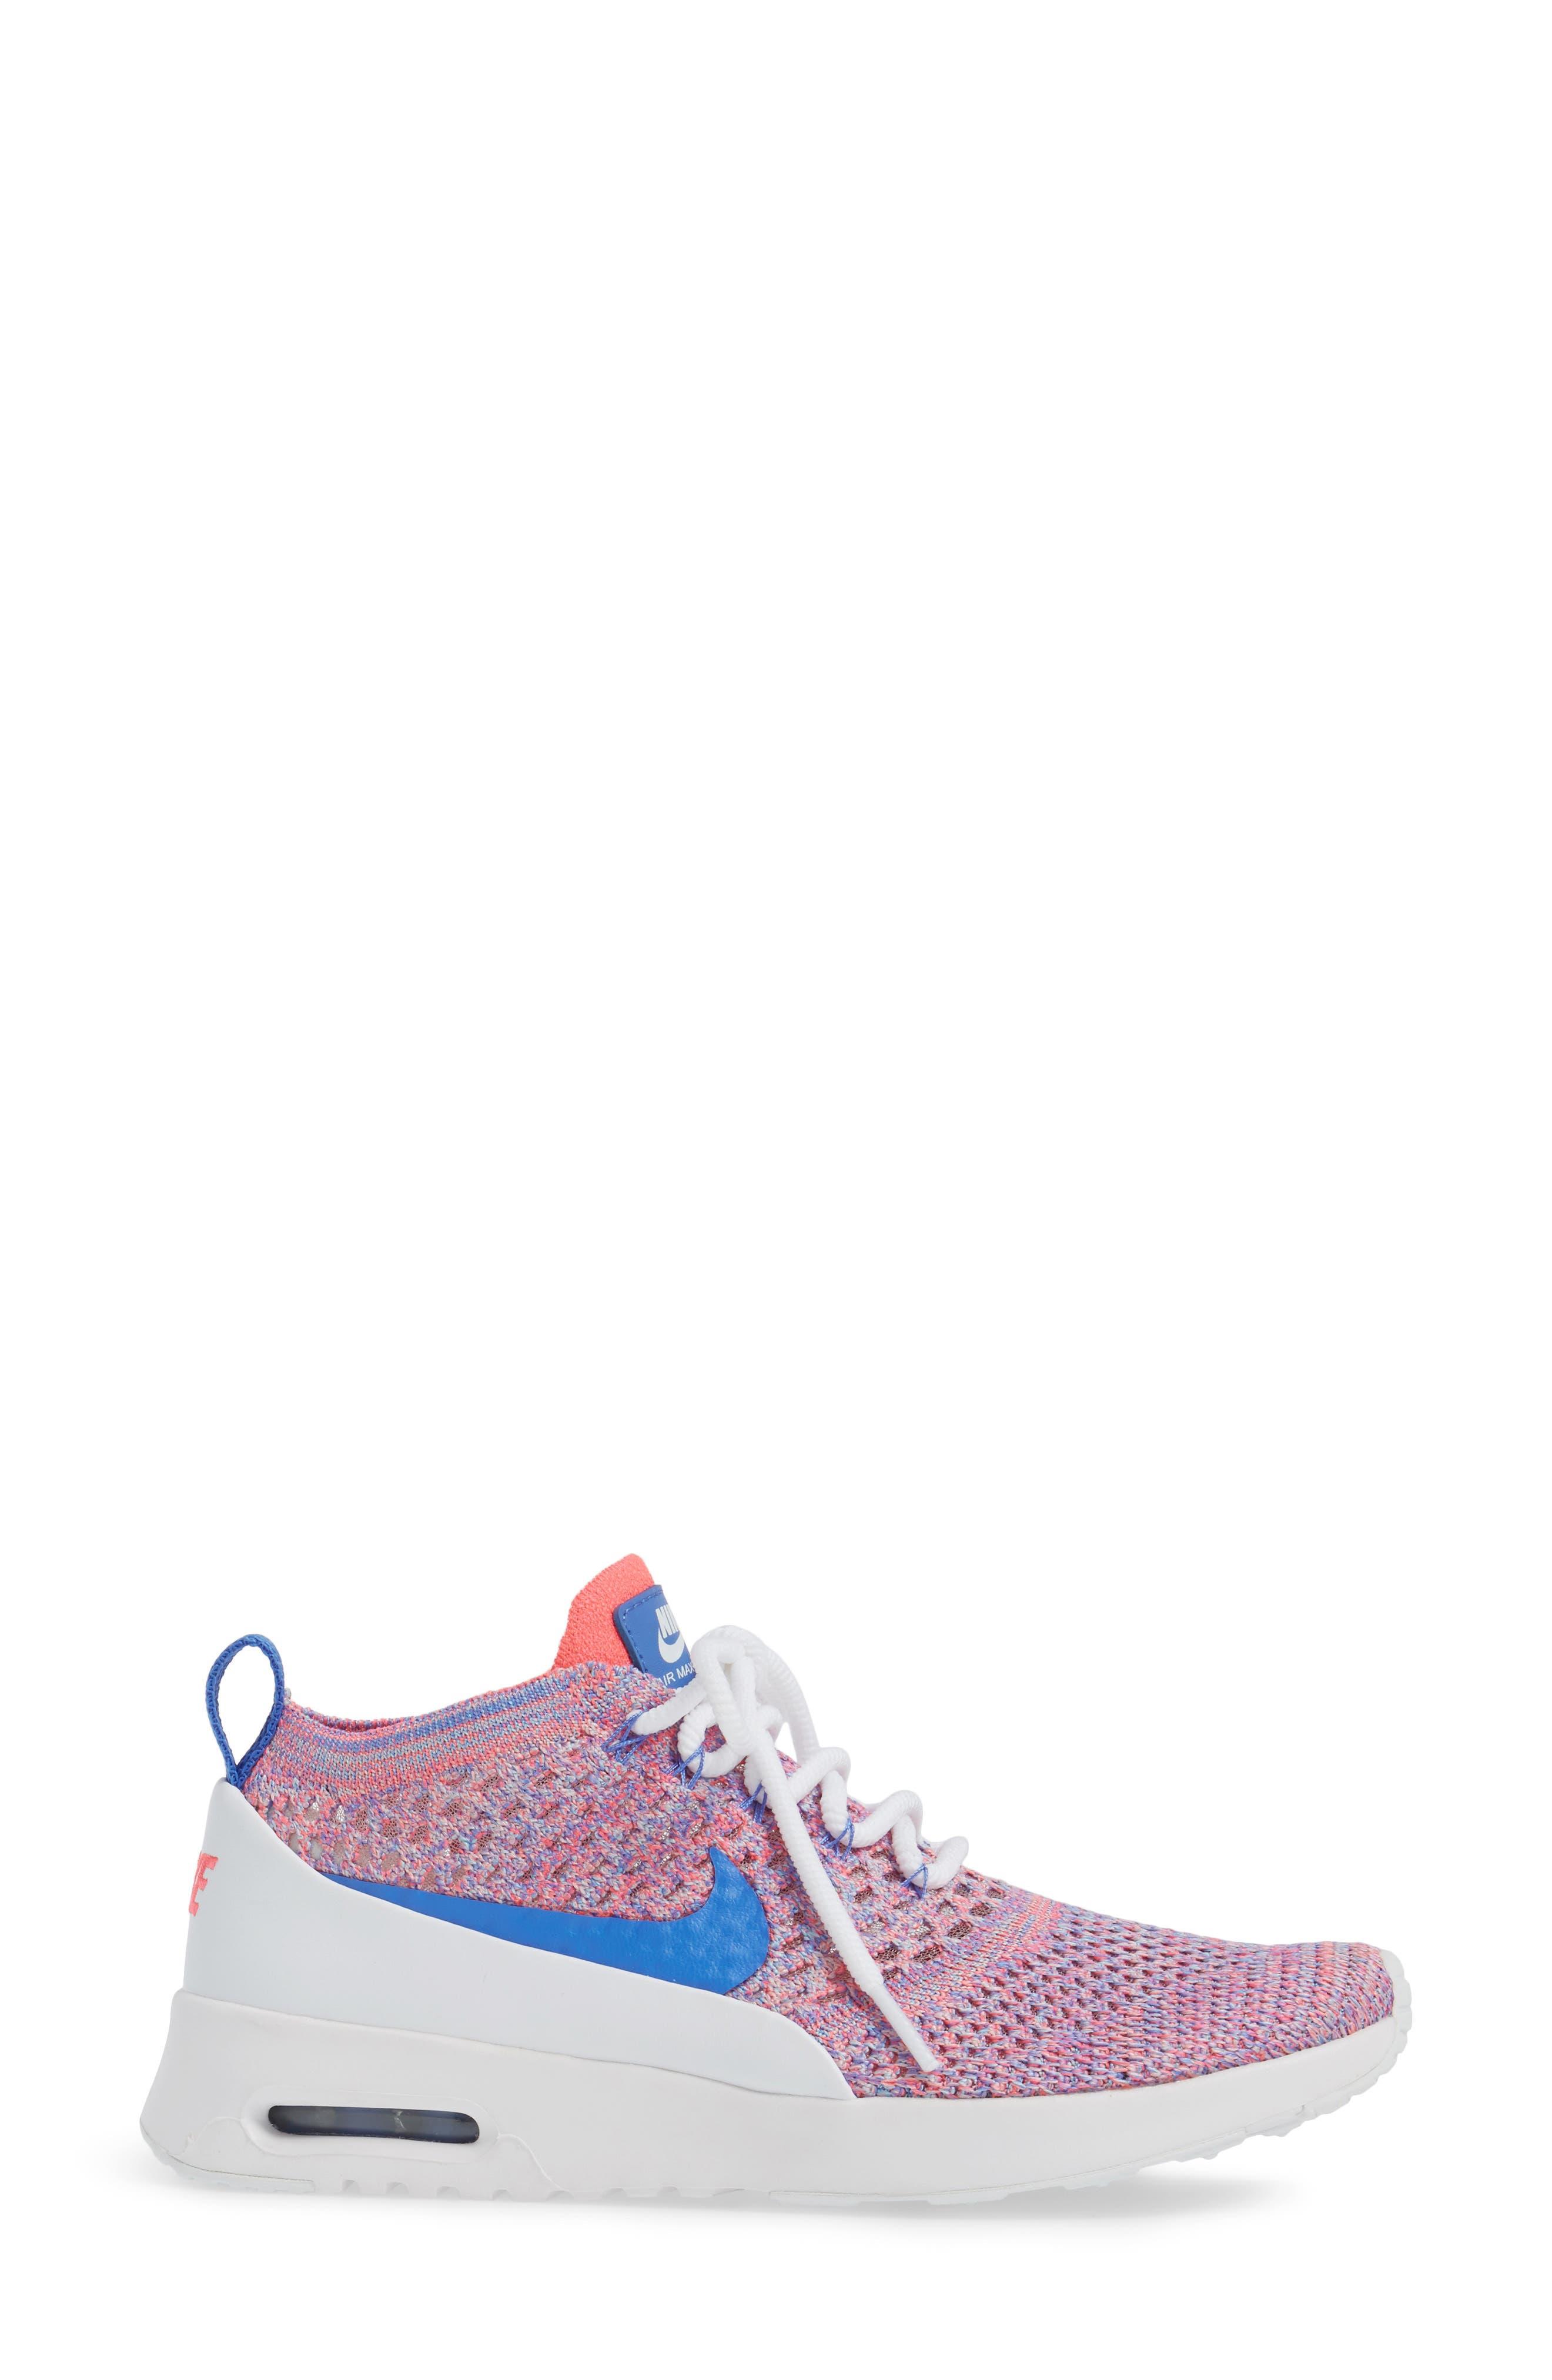 Alternate Image 3  - Nike Air Max Thea Ultra Flyknit Sneaker (Women)